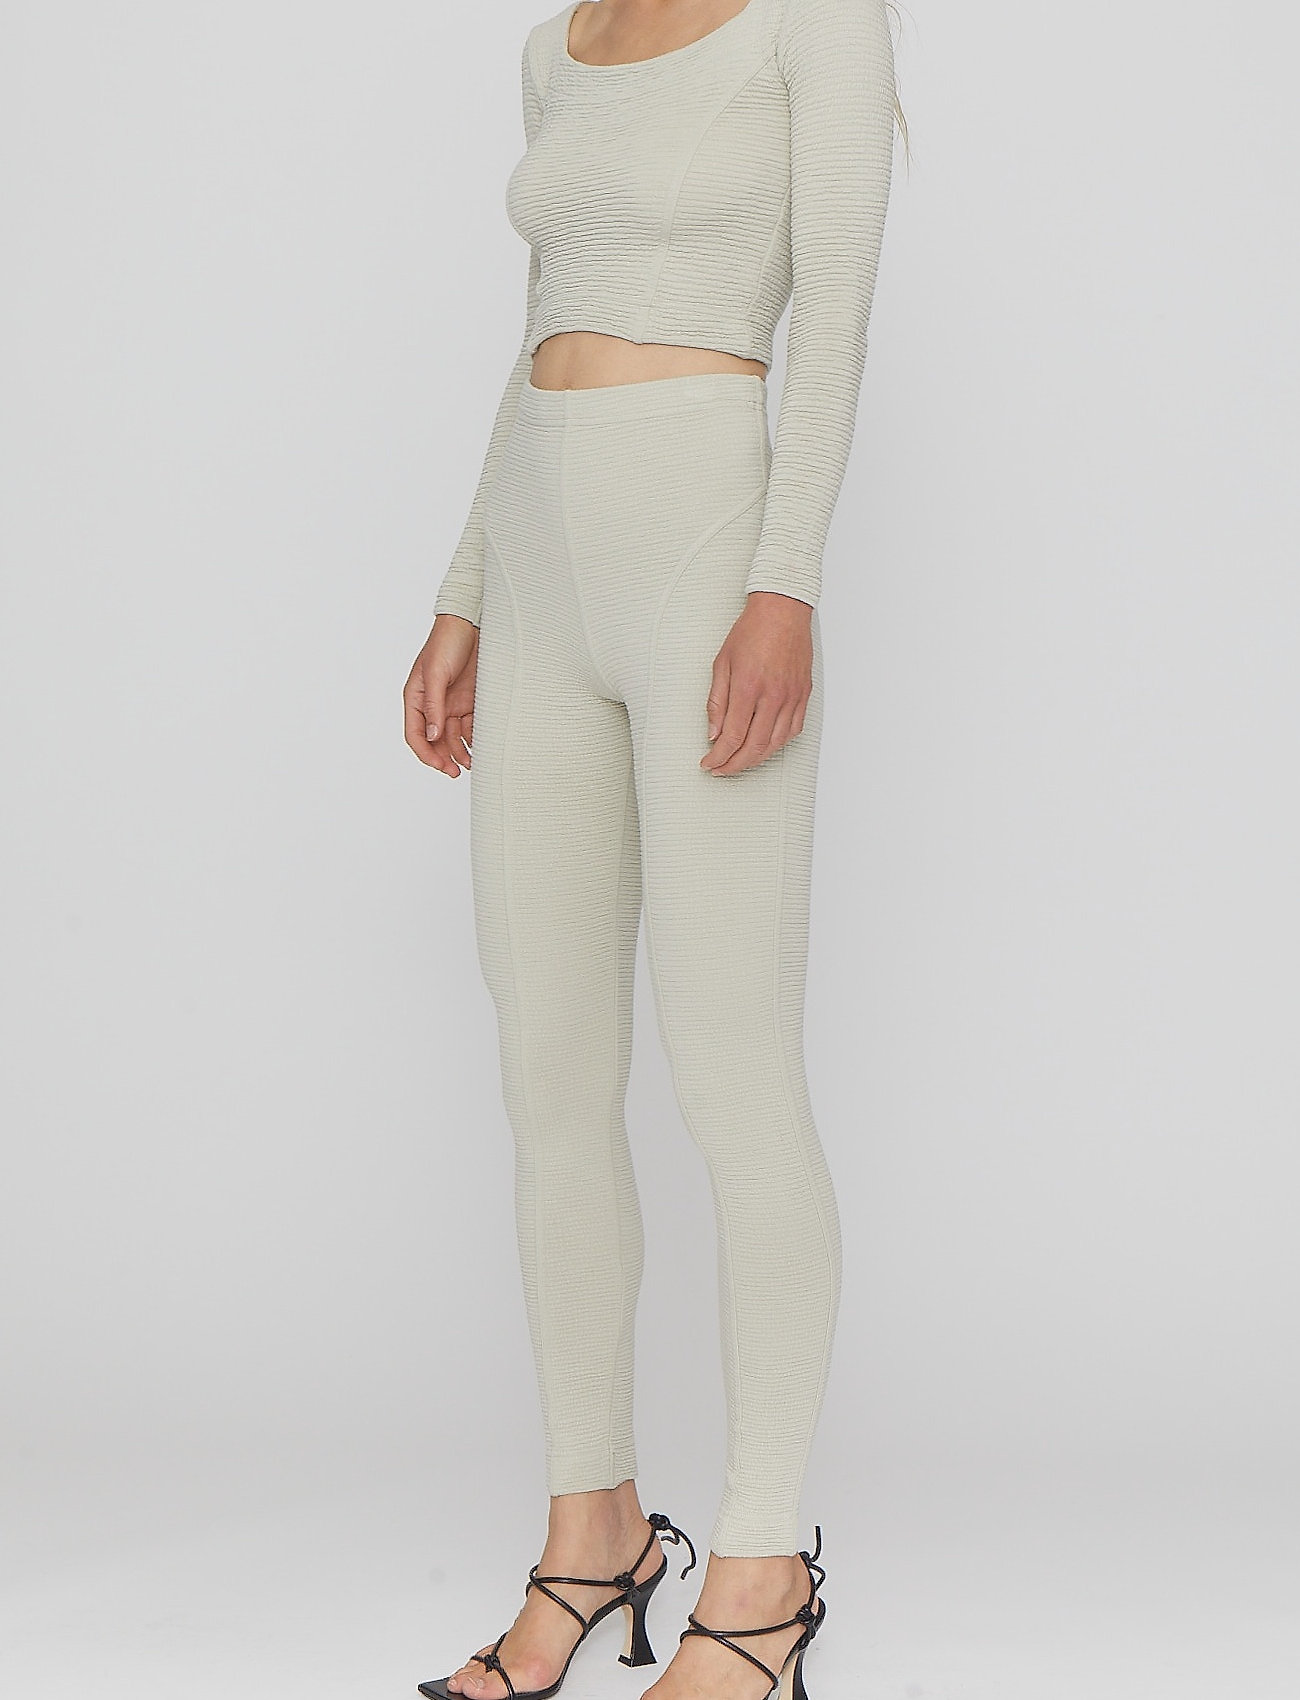 REMAIN Birger Christensen - Marisa Tights - leggings - pelican - 3